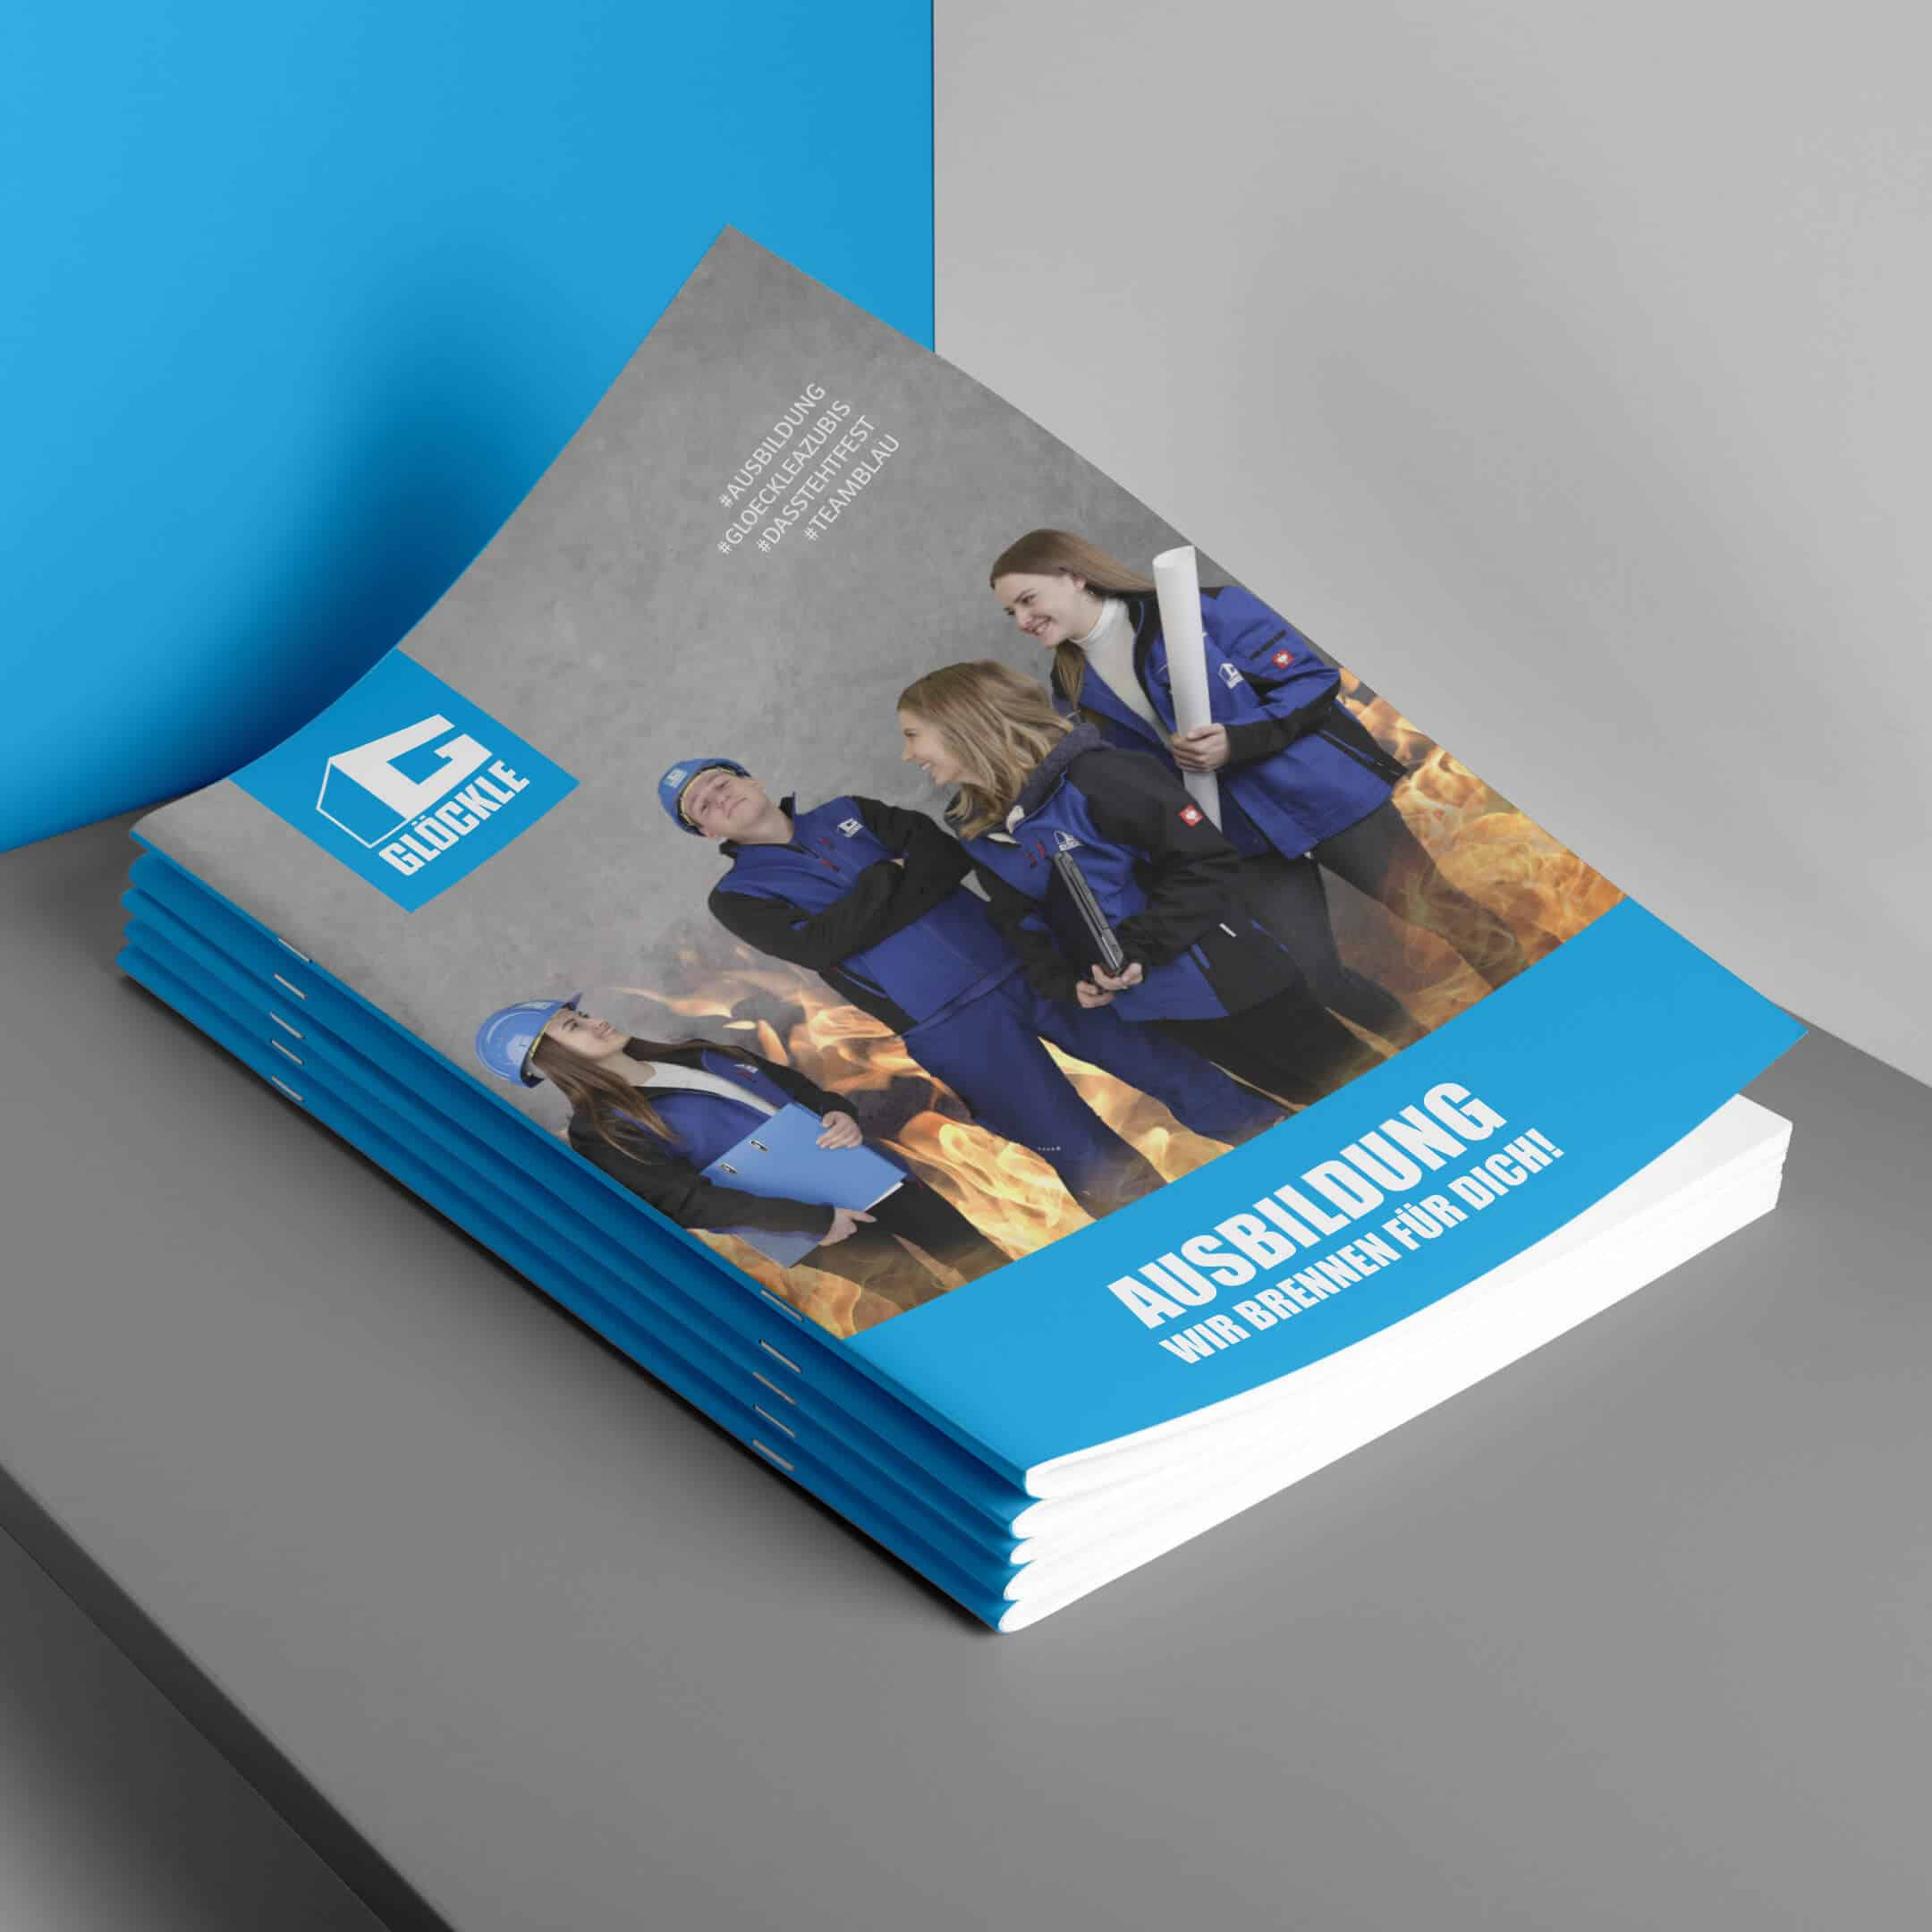 Glöckle-Tag-der-Ausbildung-Cover_Mobile